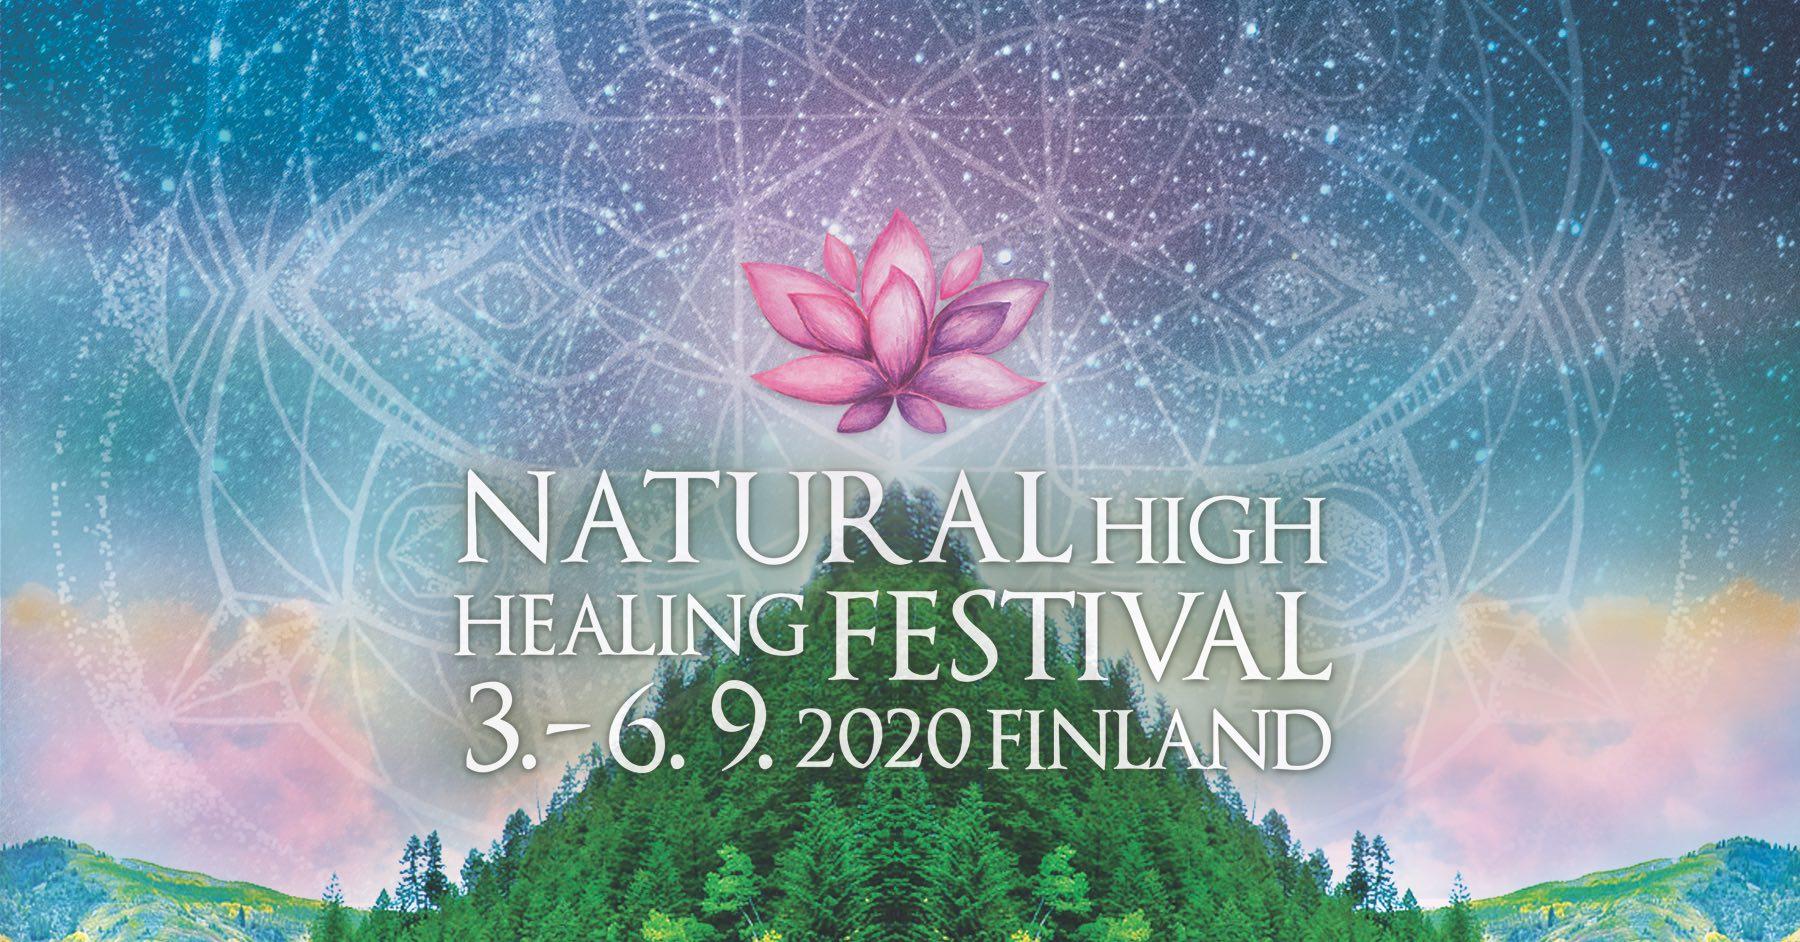 Natural High Festival 2020